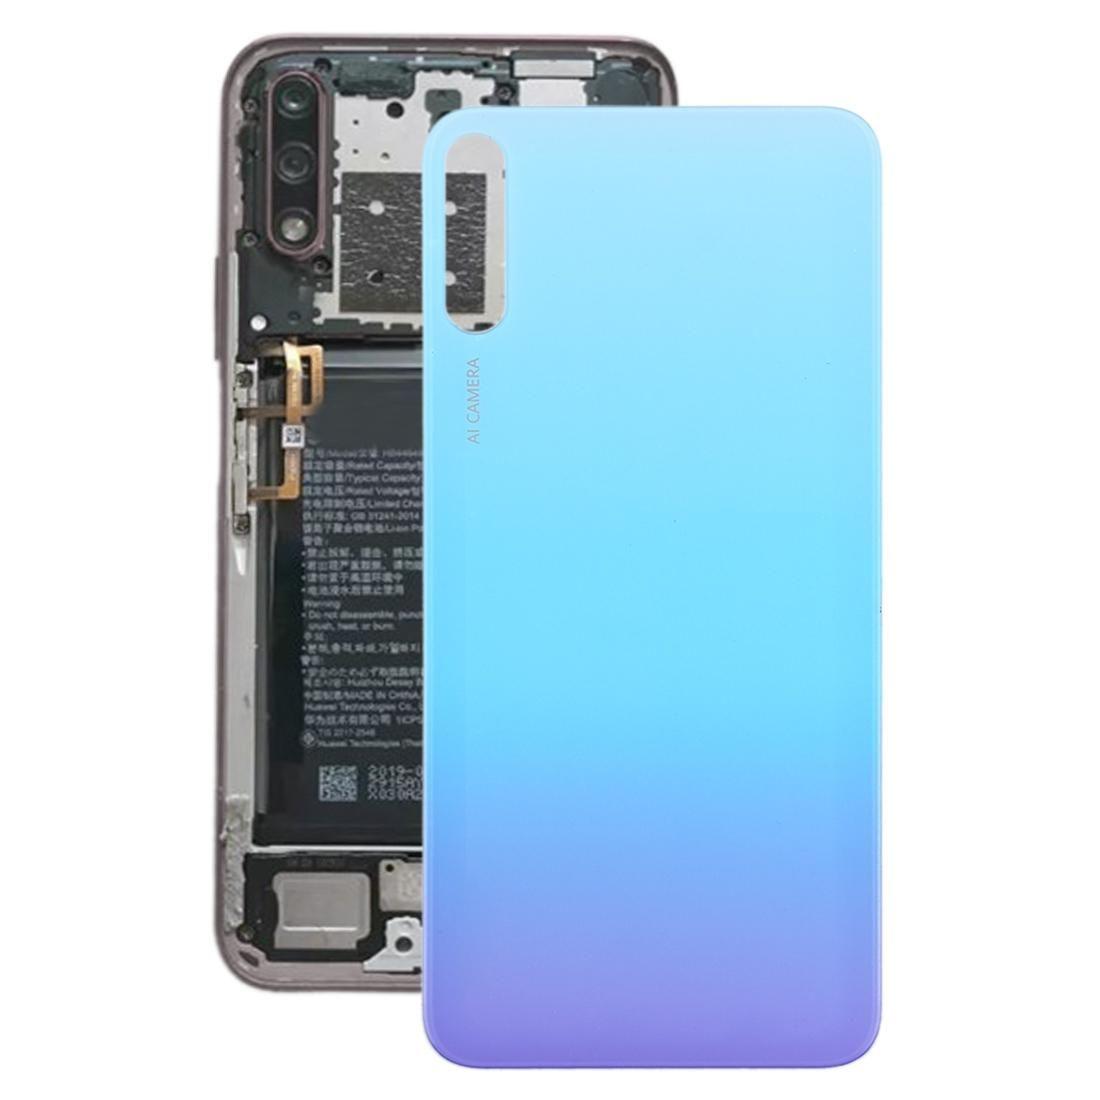 Bateria tampa traseira para Huawei Desfrute de 10